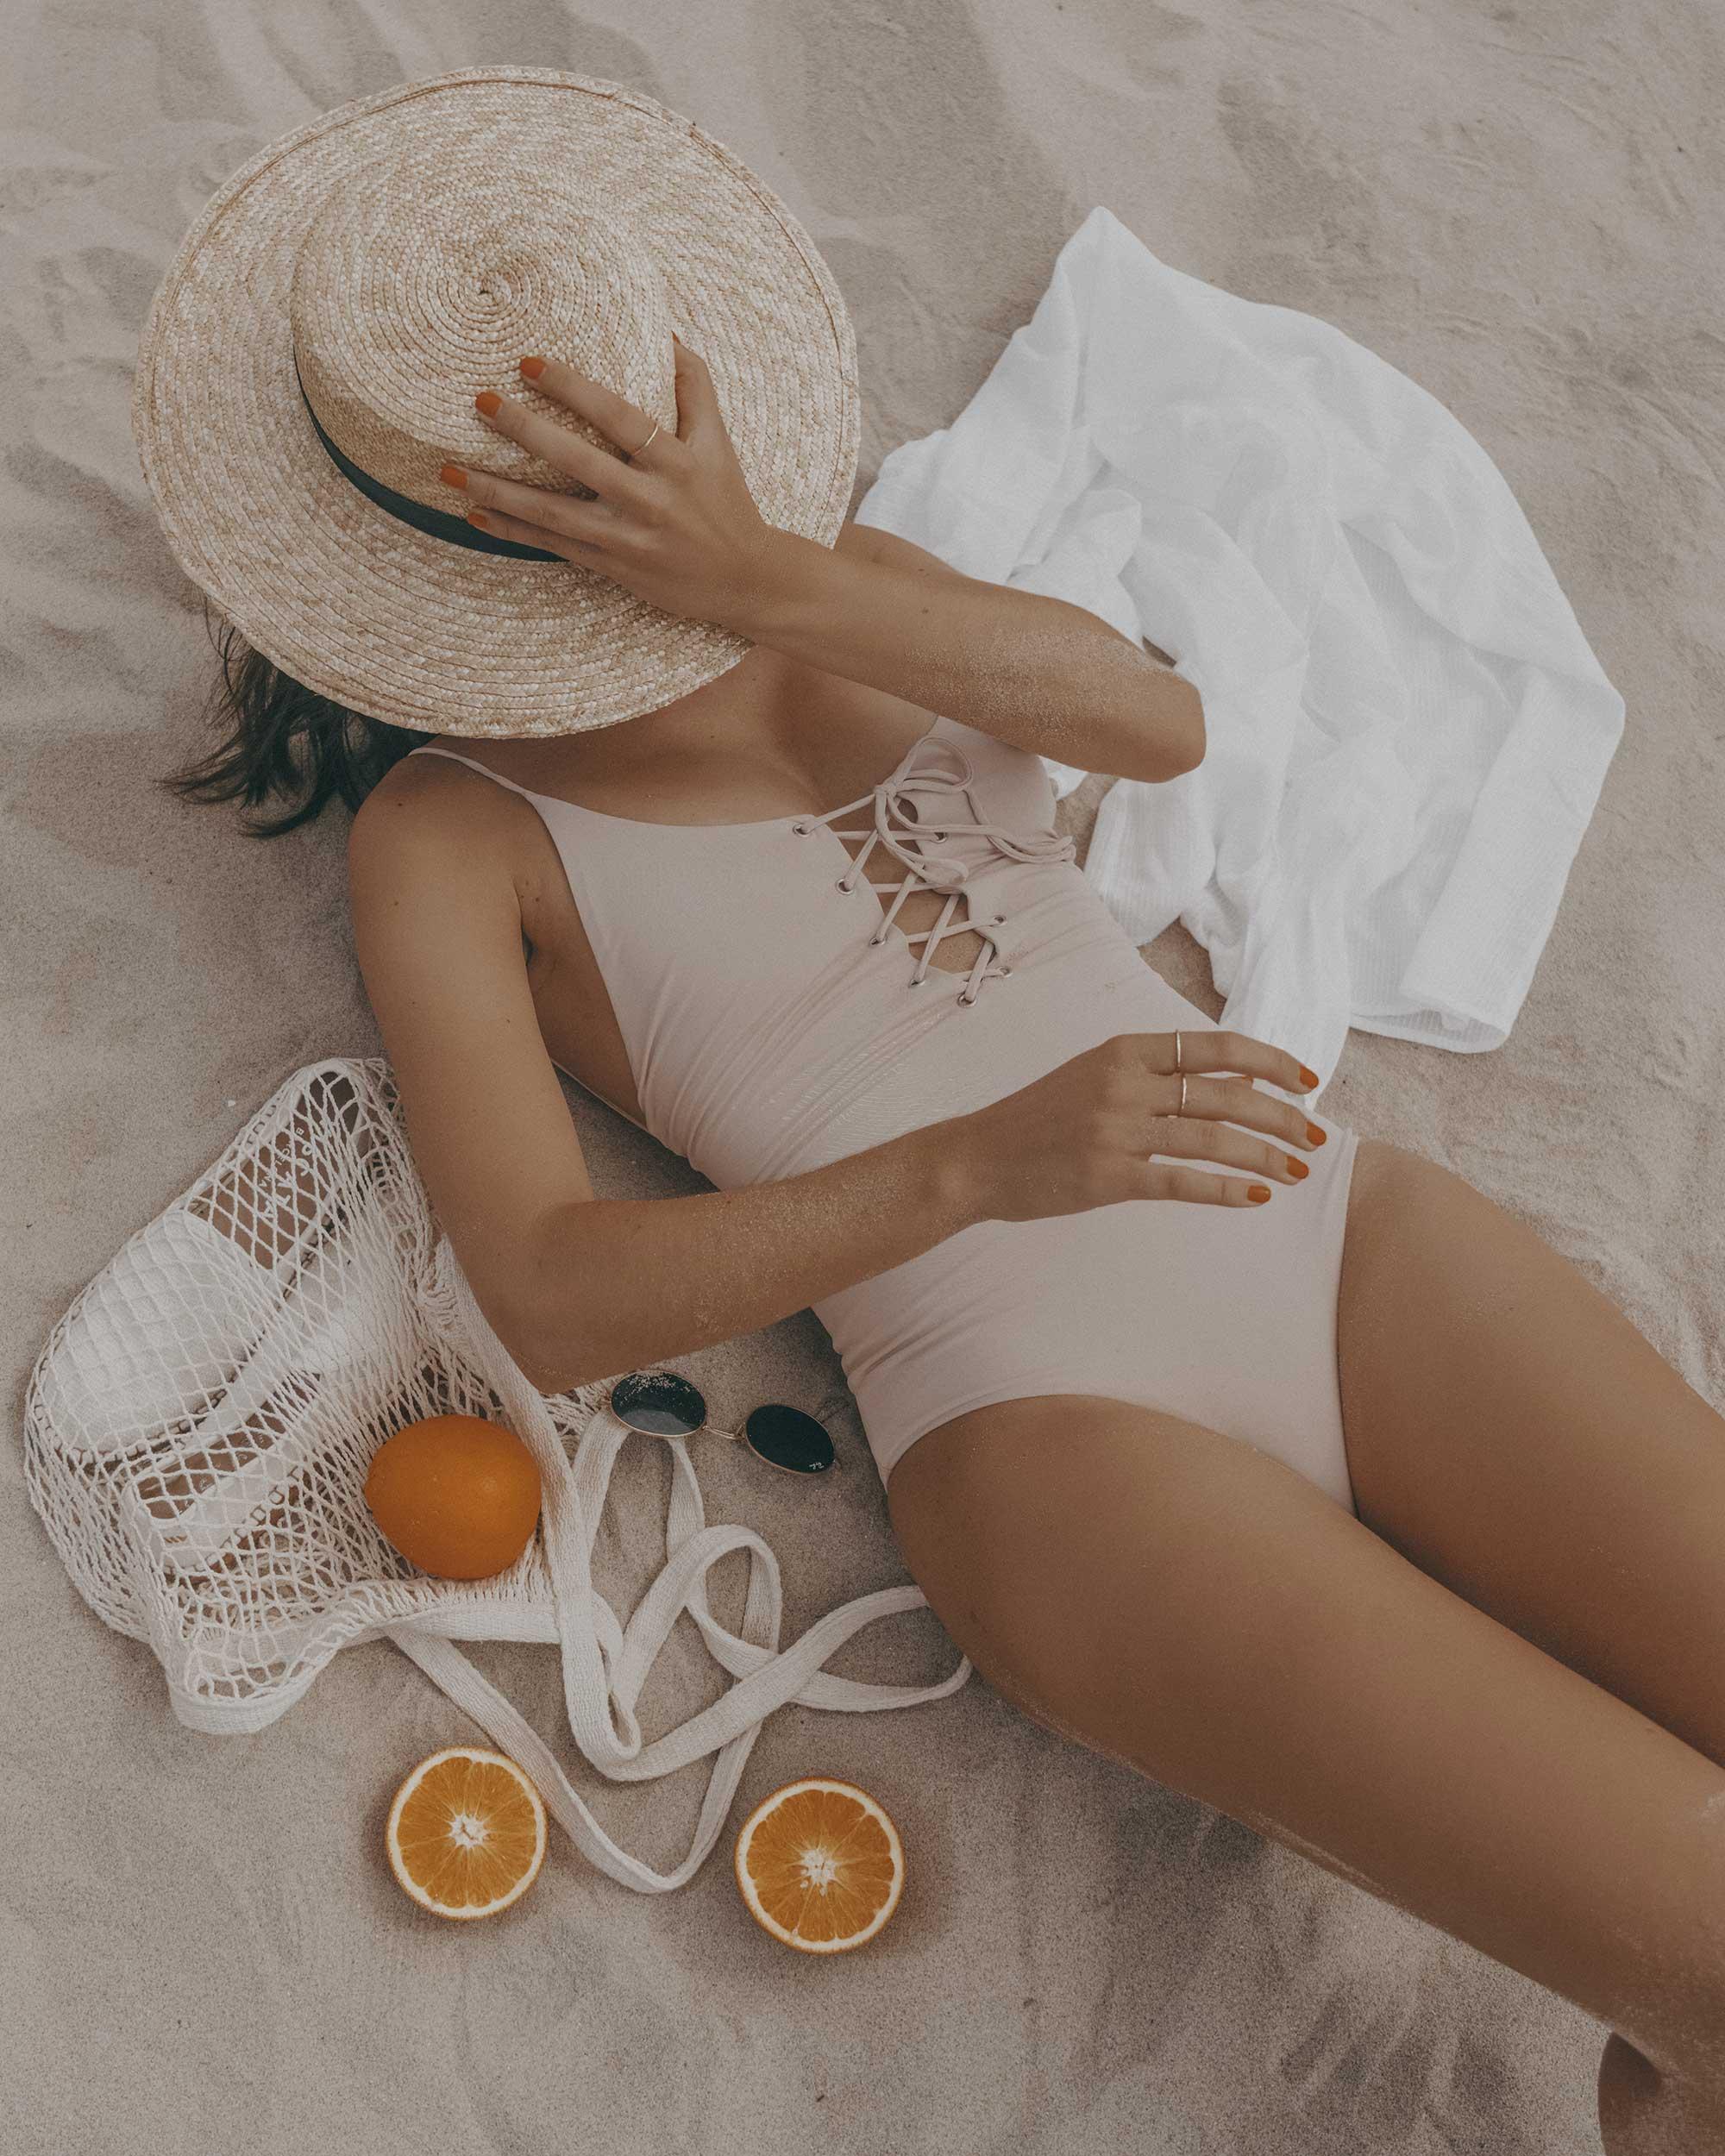 Tavik-swimwear-lace-up-front-one-piece-swimsuit-newport-beach-california-10.jpg